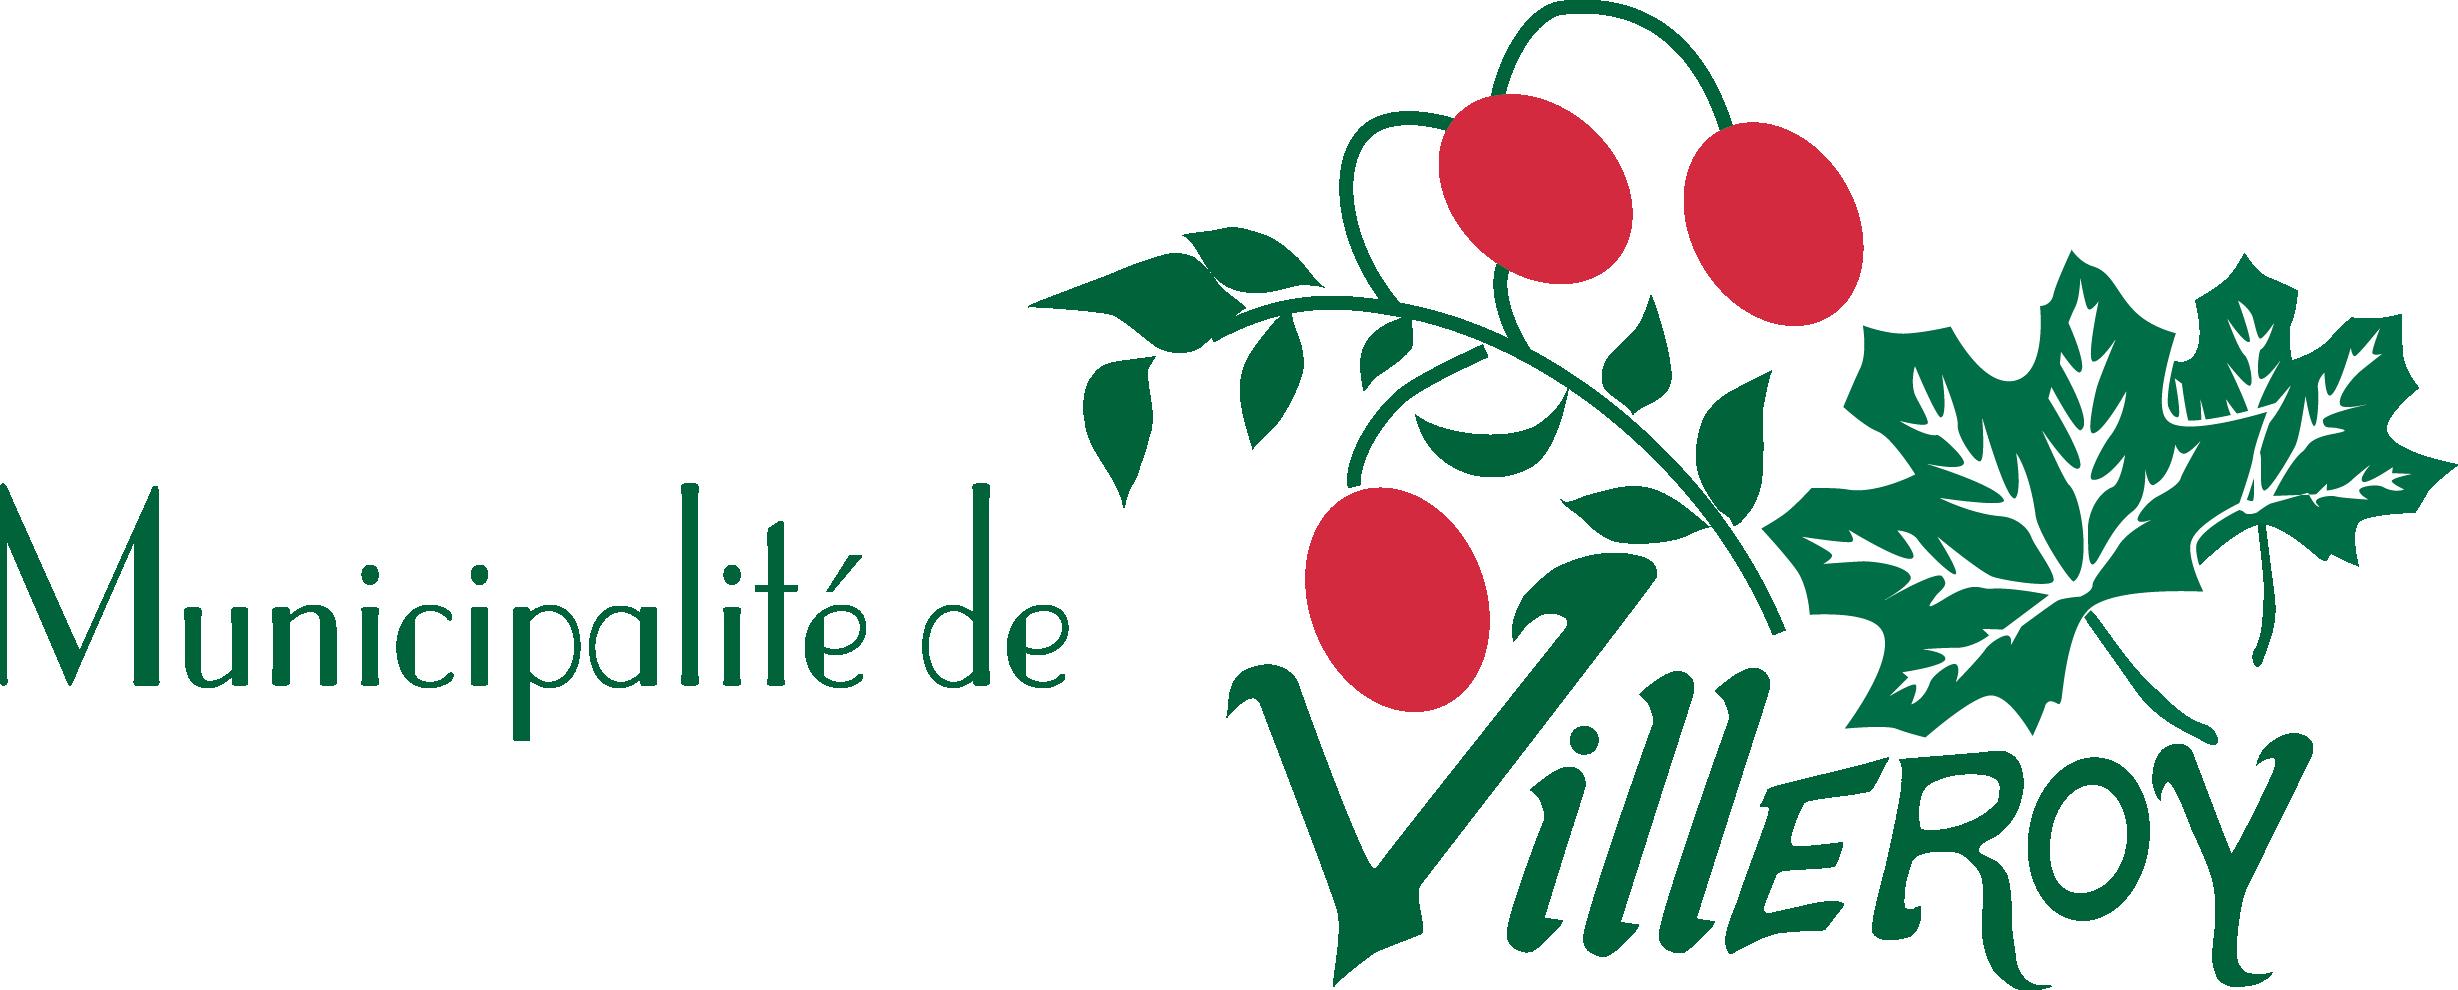 Municipalité de Villeroy